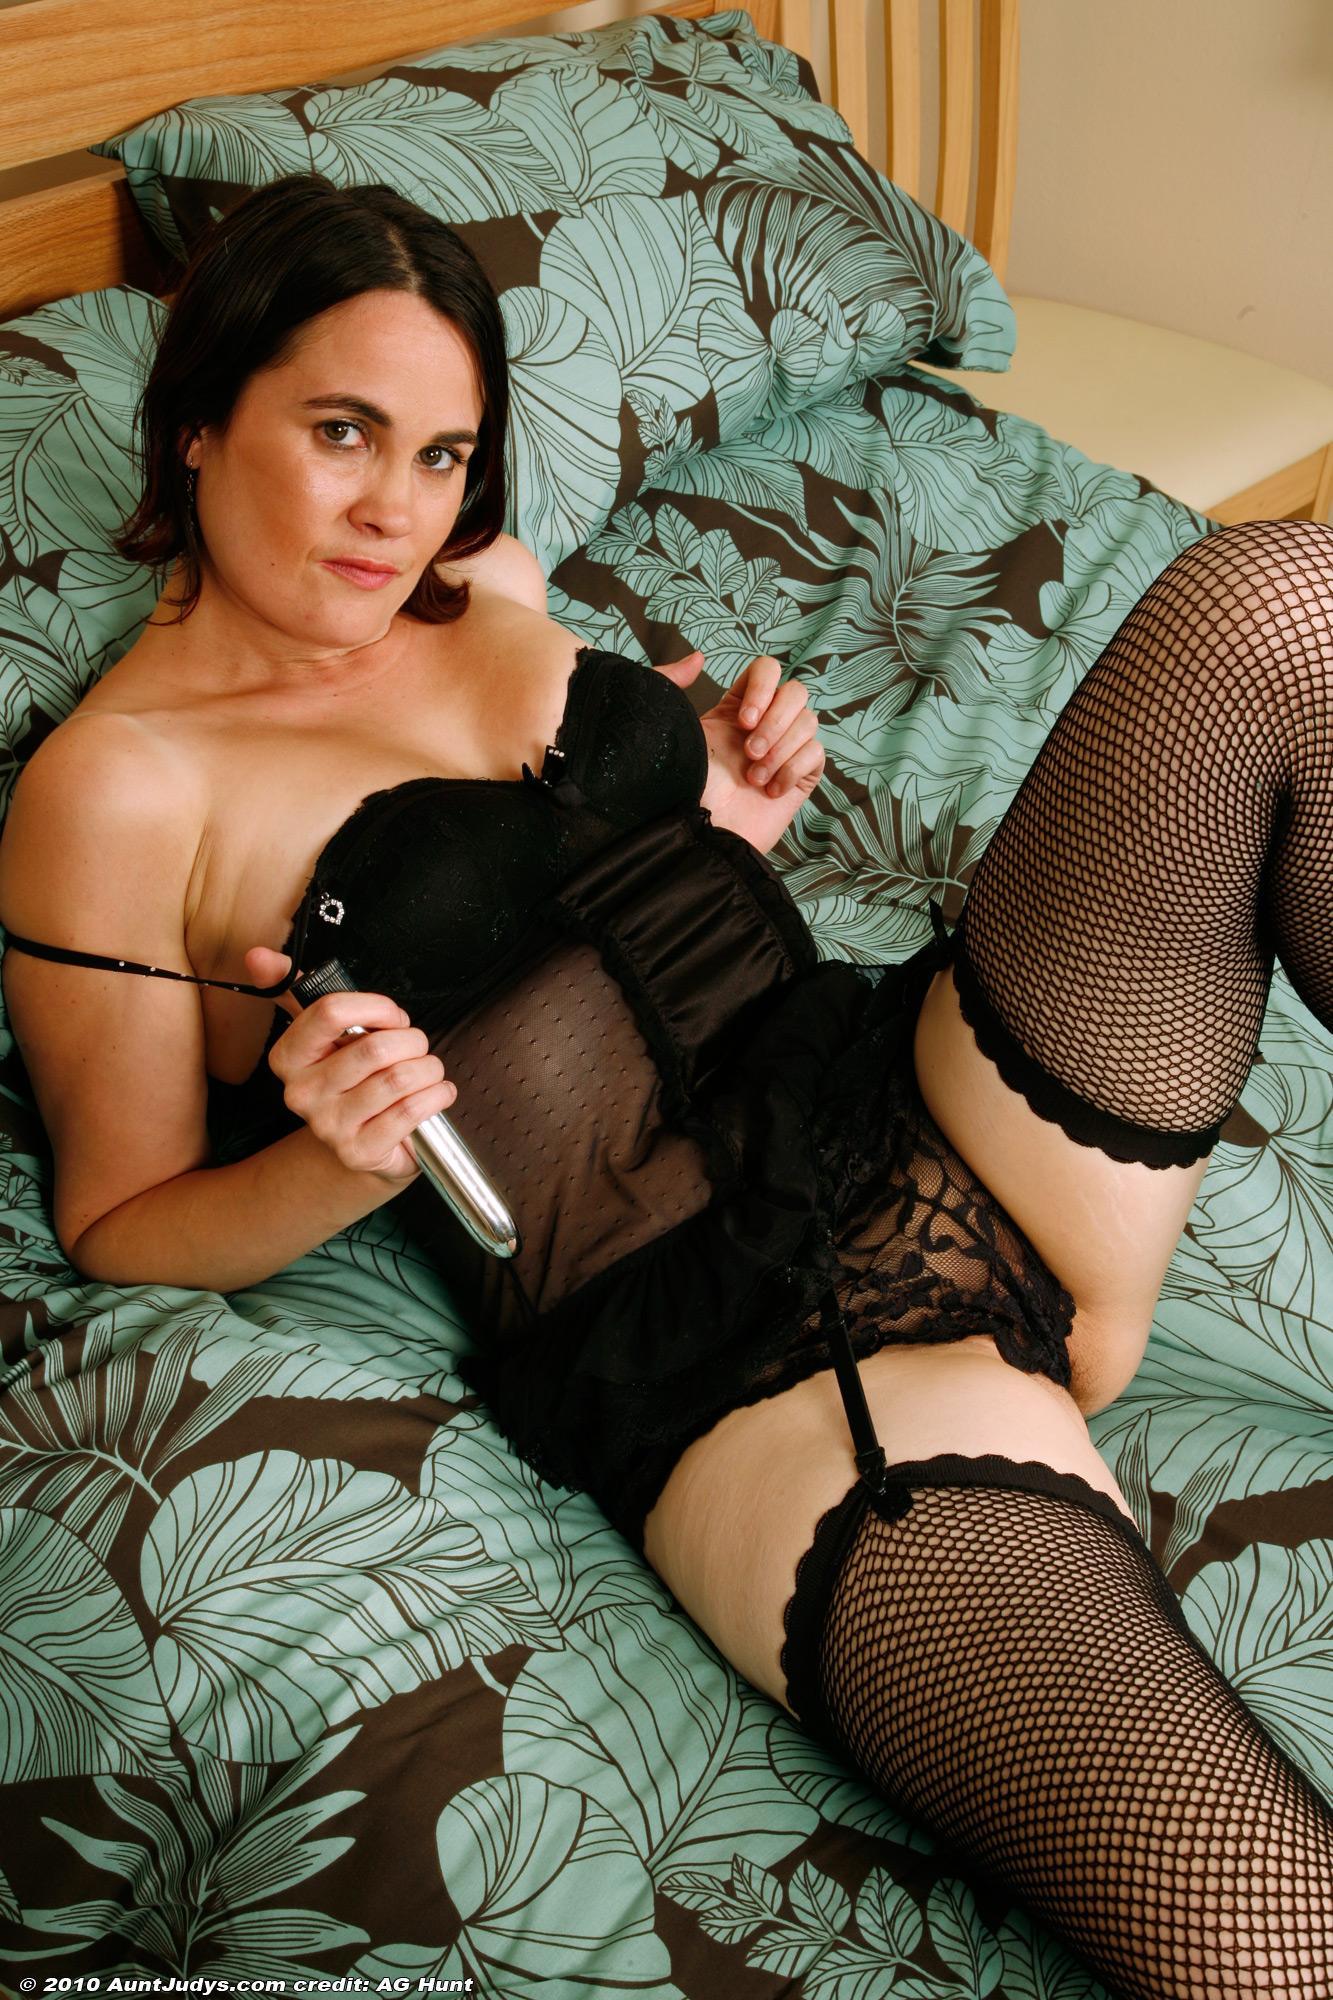 elderly brunette doll in black pantyhose ramming sex toy into